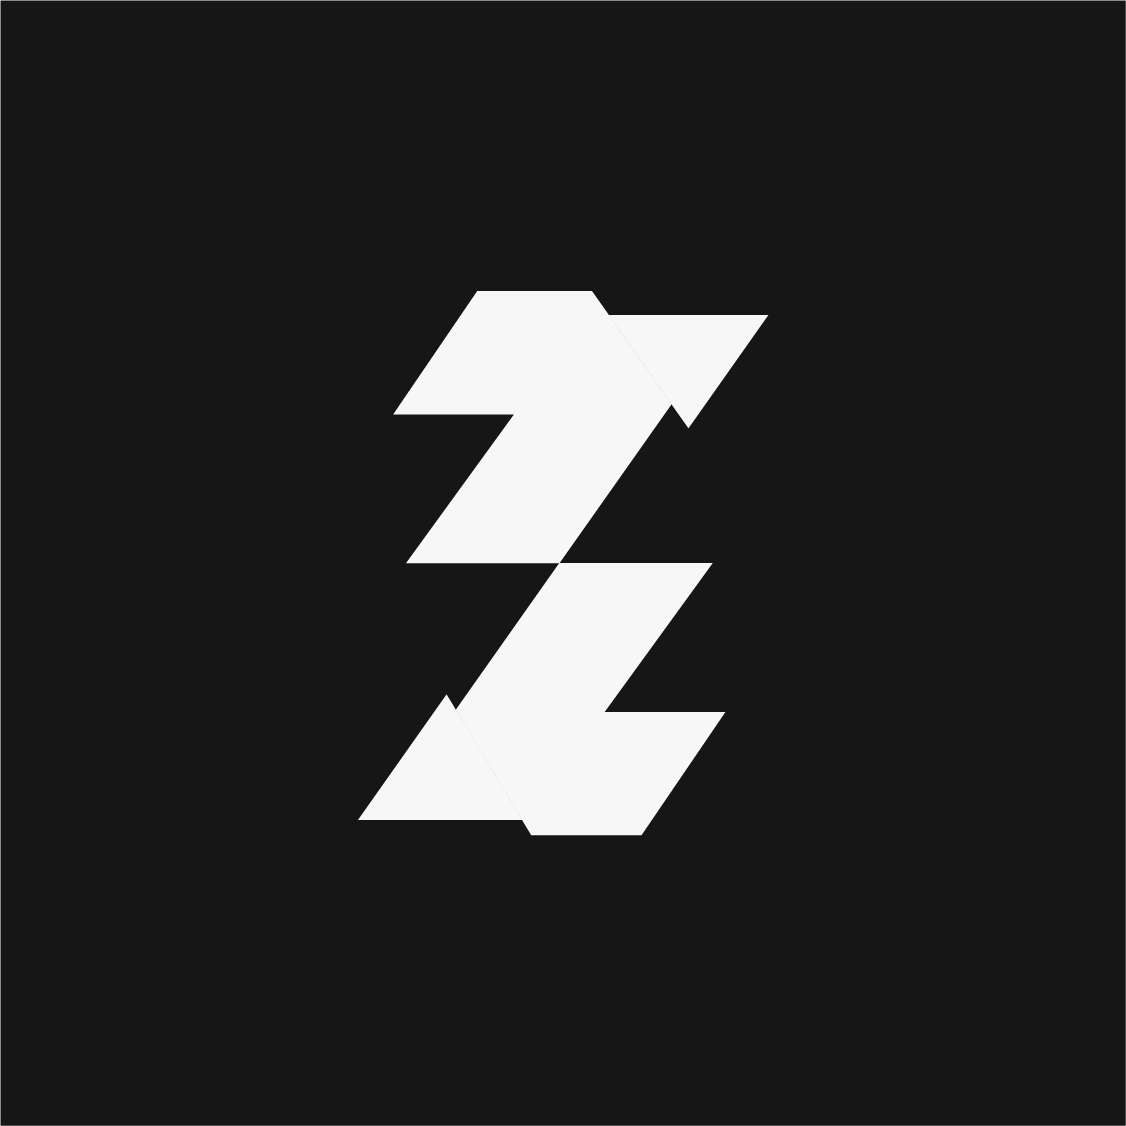 all-logos-2020-33